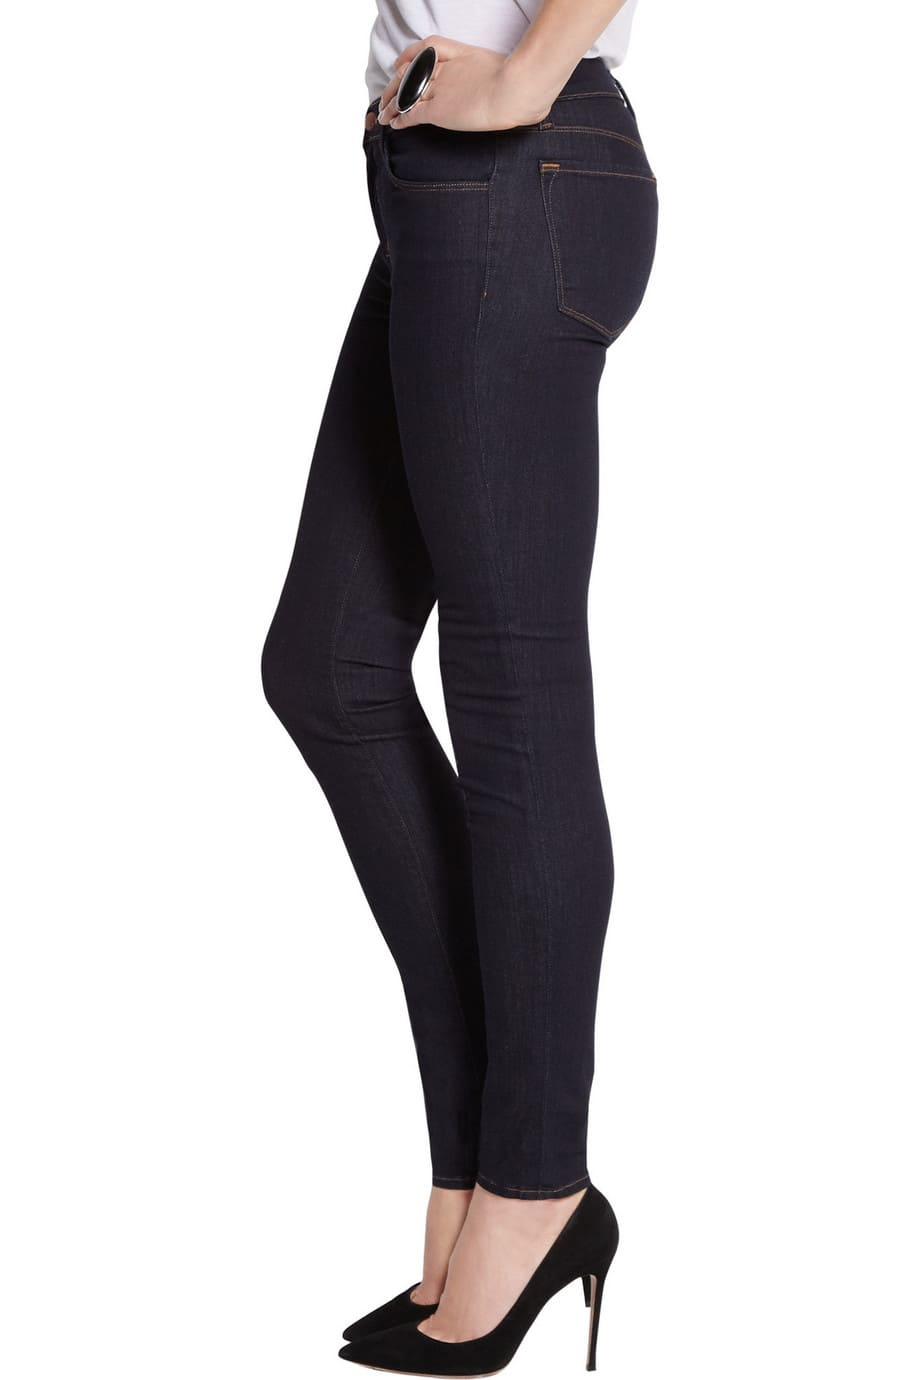 image Arborer le look de (Black Widow) Natasha Romanoff en jeans J Brand 21